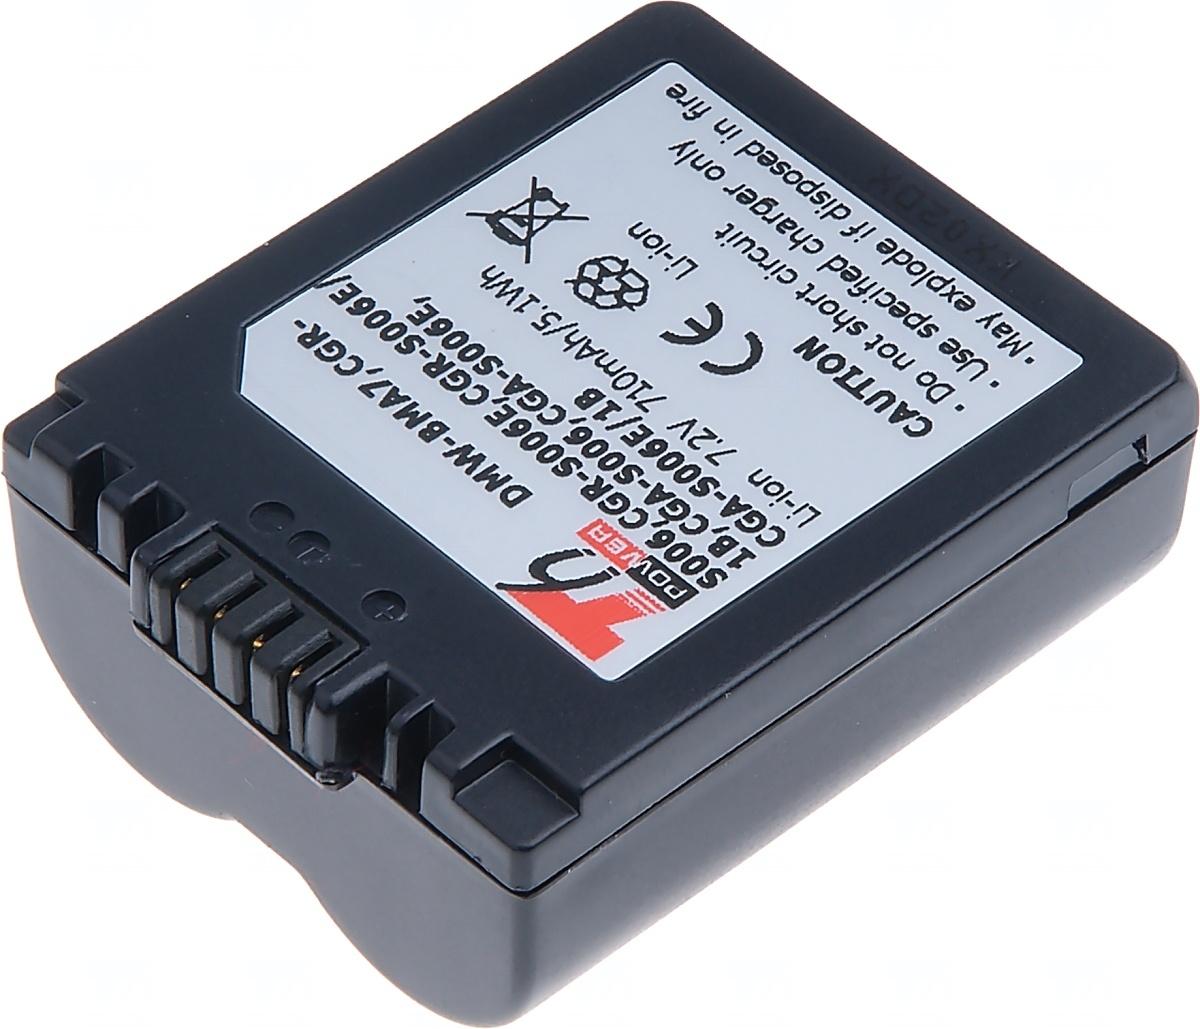 Baterie T6 power Panasonic DMW-BMA7, CGR-S006, CGR-S006E, CGA-S006, 710mAh, modrá; DCPA0011